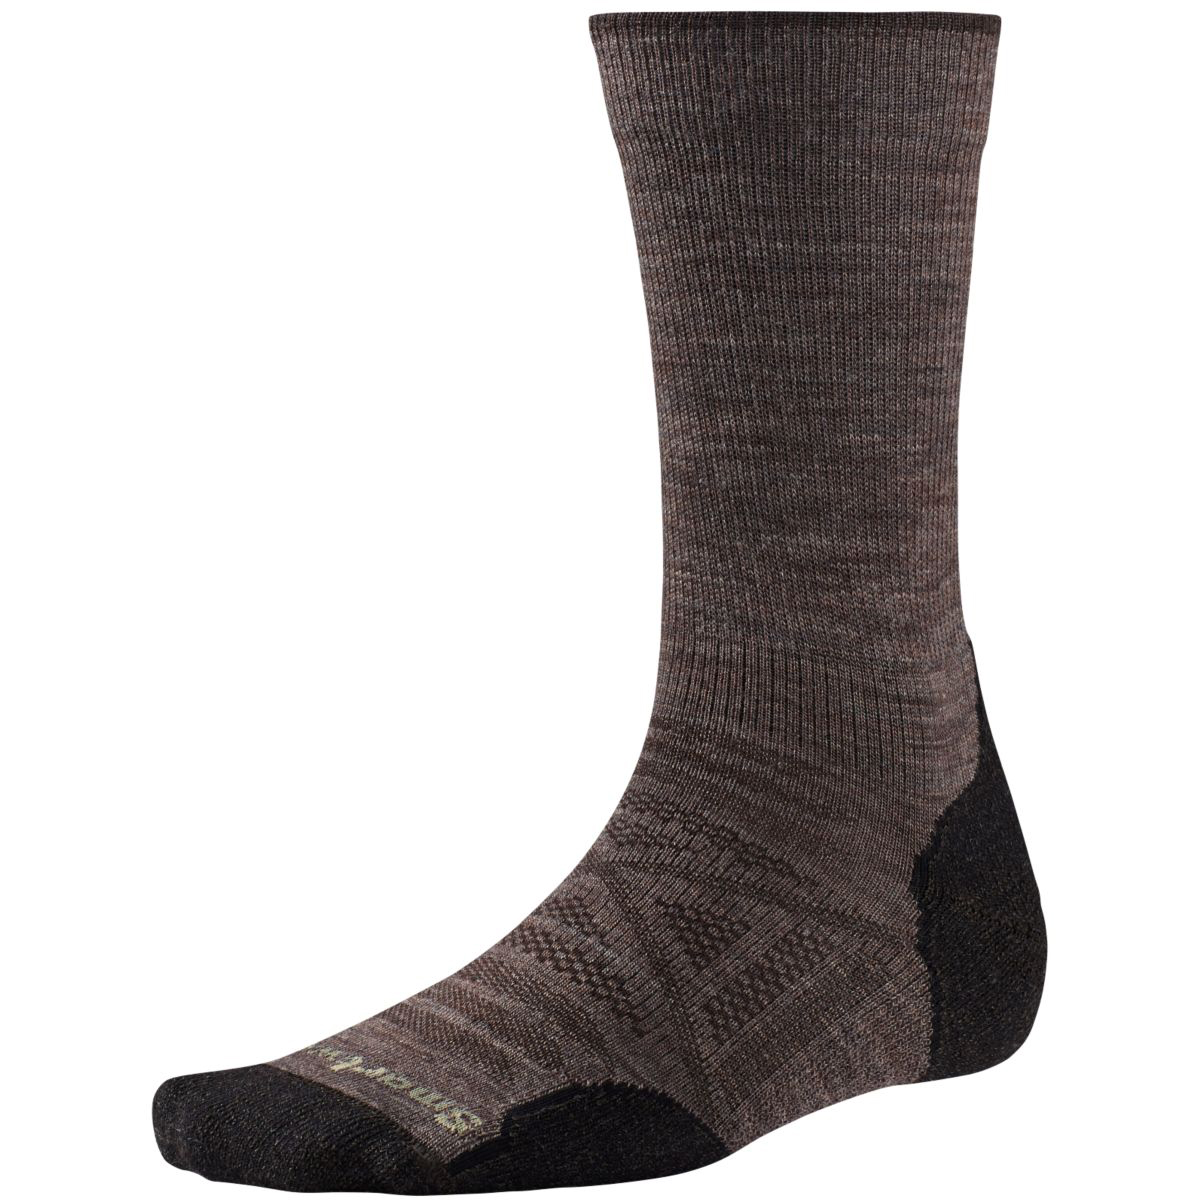 Smartwool Men's Phd Outdoor Light Crew Socks - Black, M